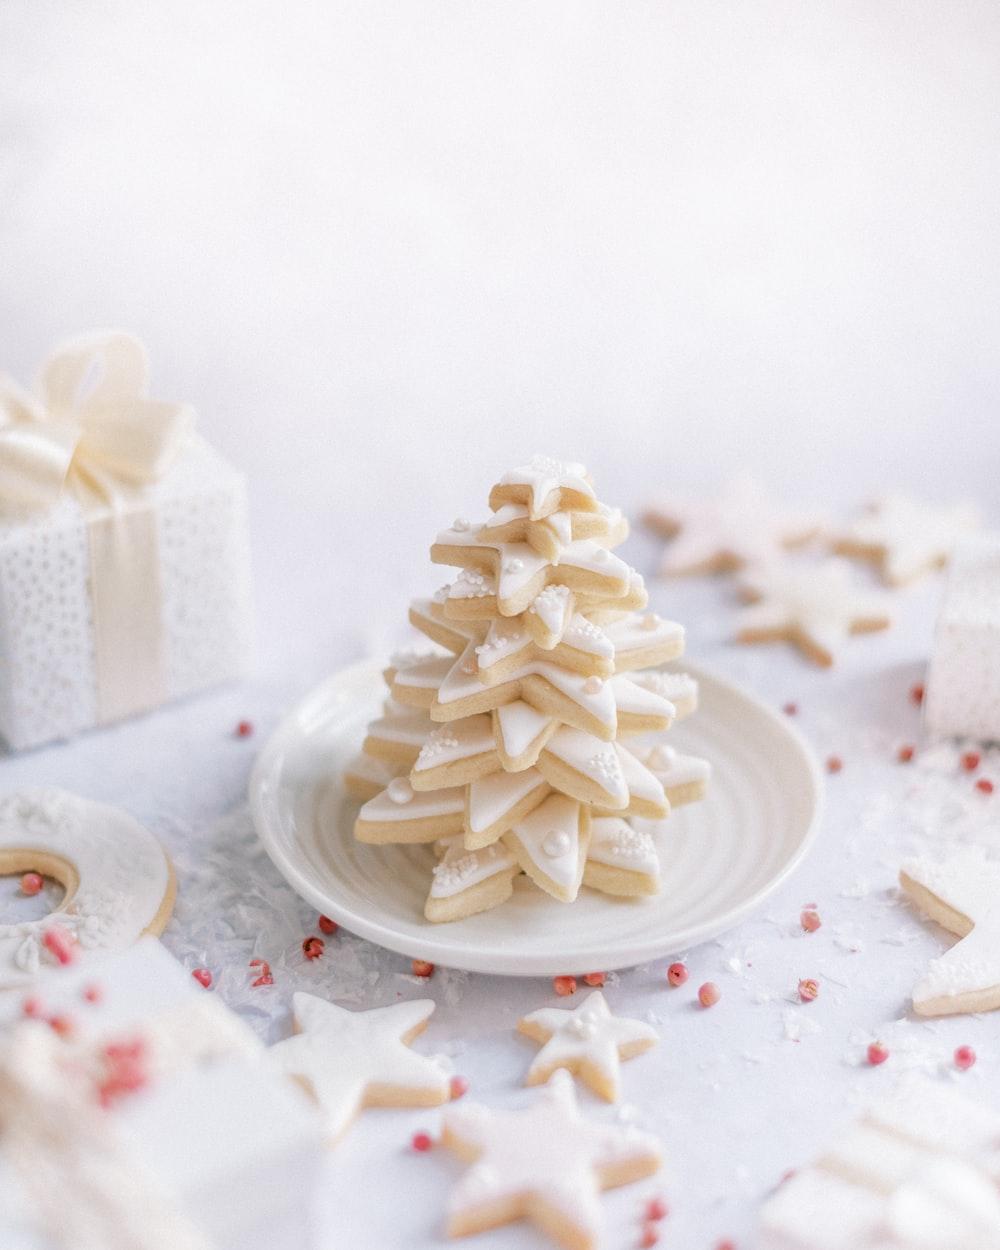 White star Christmas cookies on white ceramic plate